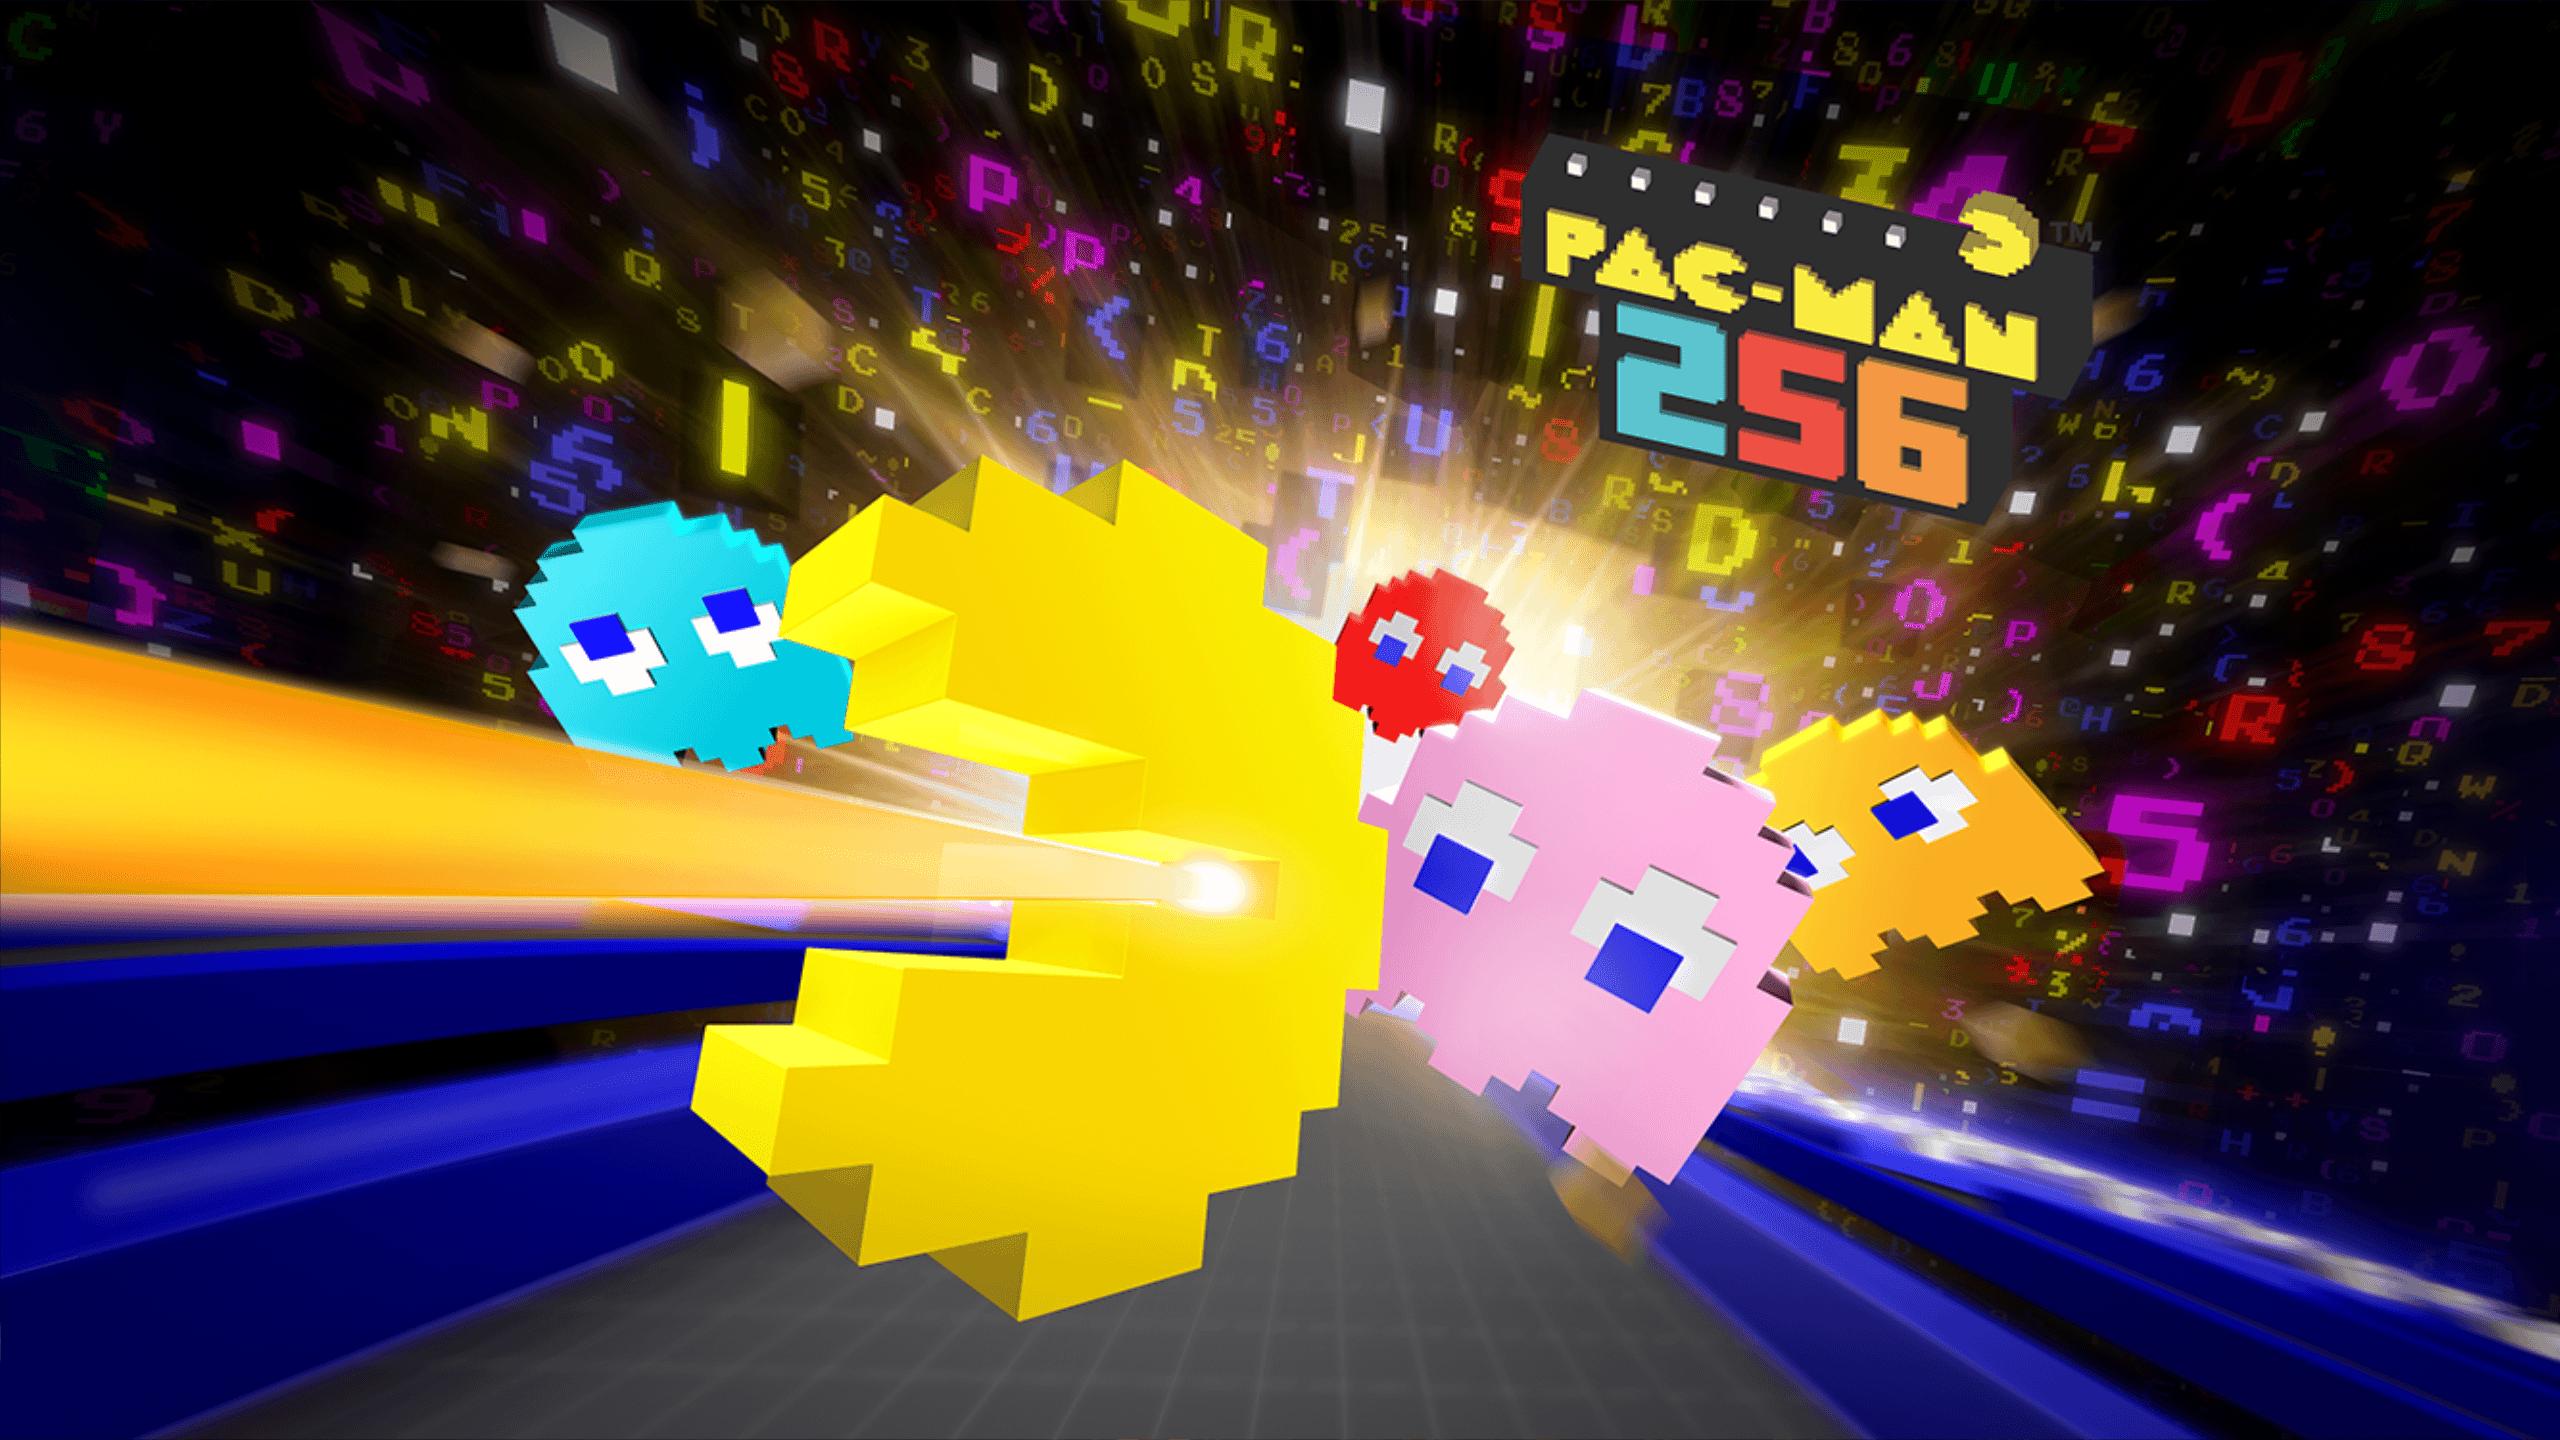 PAC-MAN 256 - Maze Tak Berujung hits Play Store